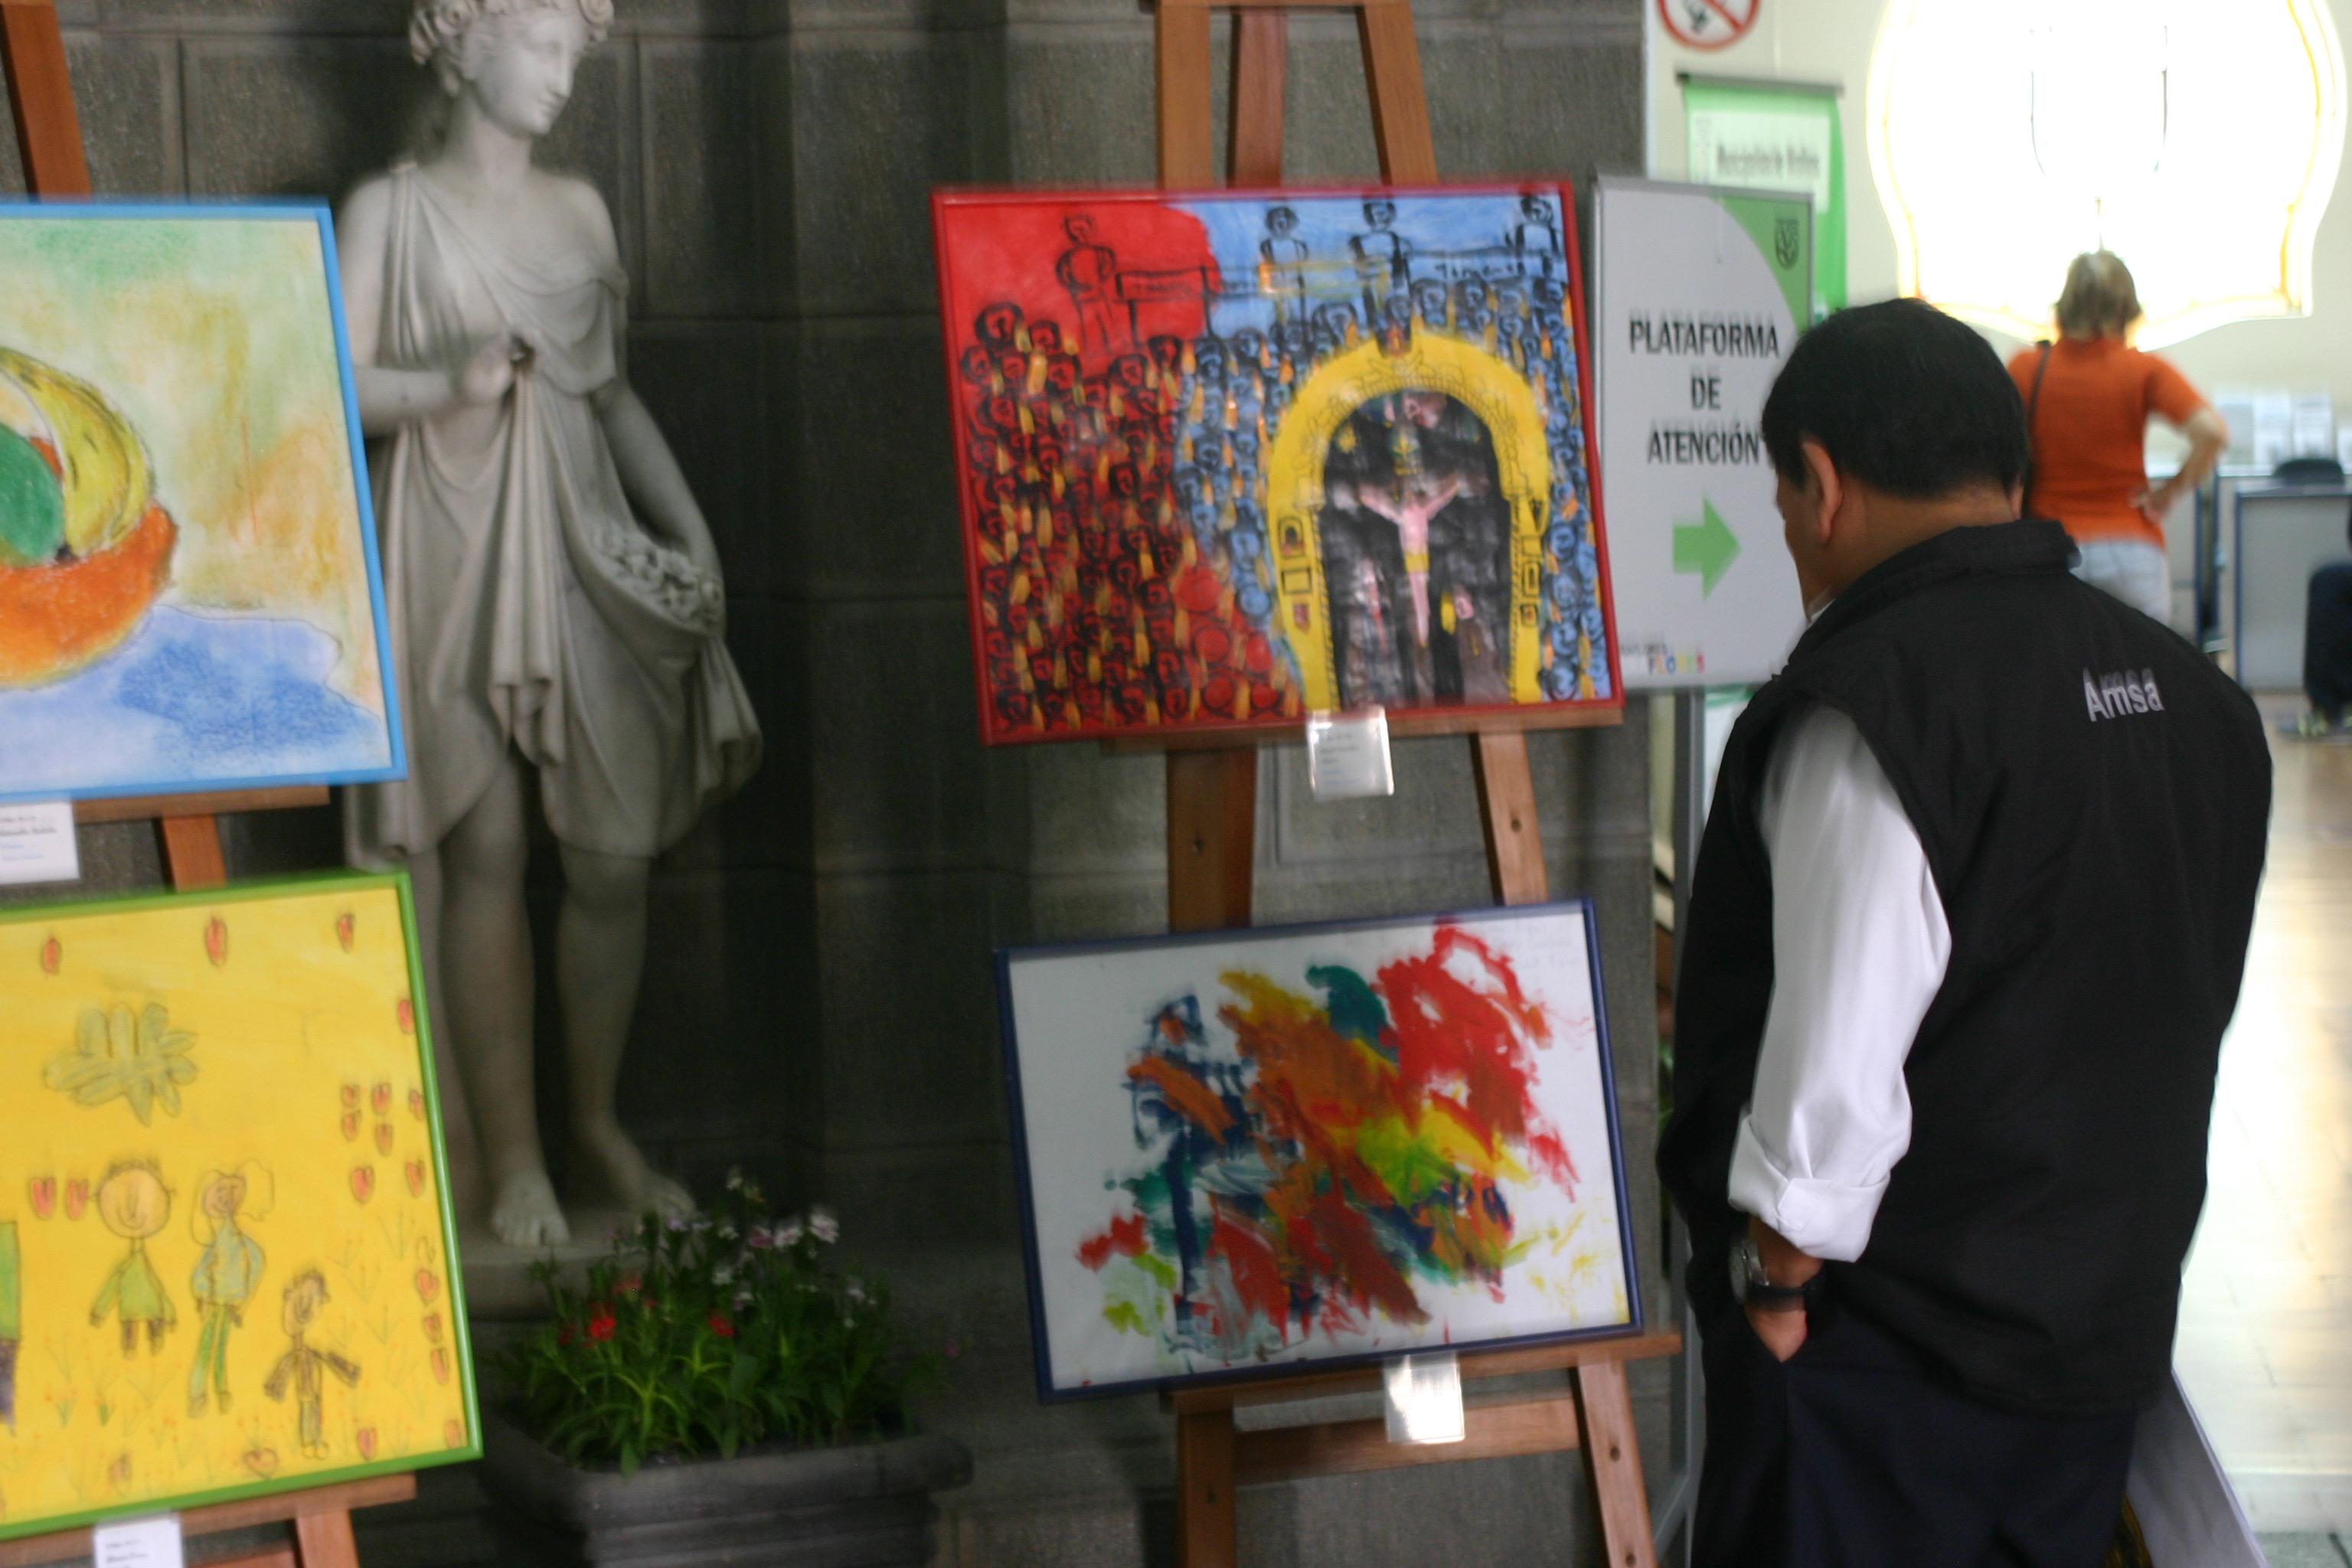 Municipio de Miraflores